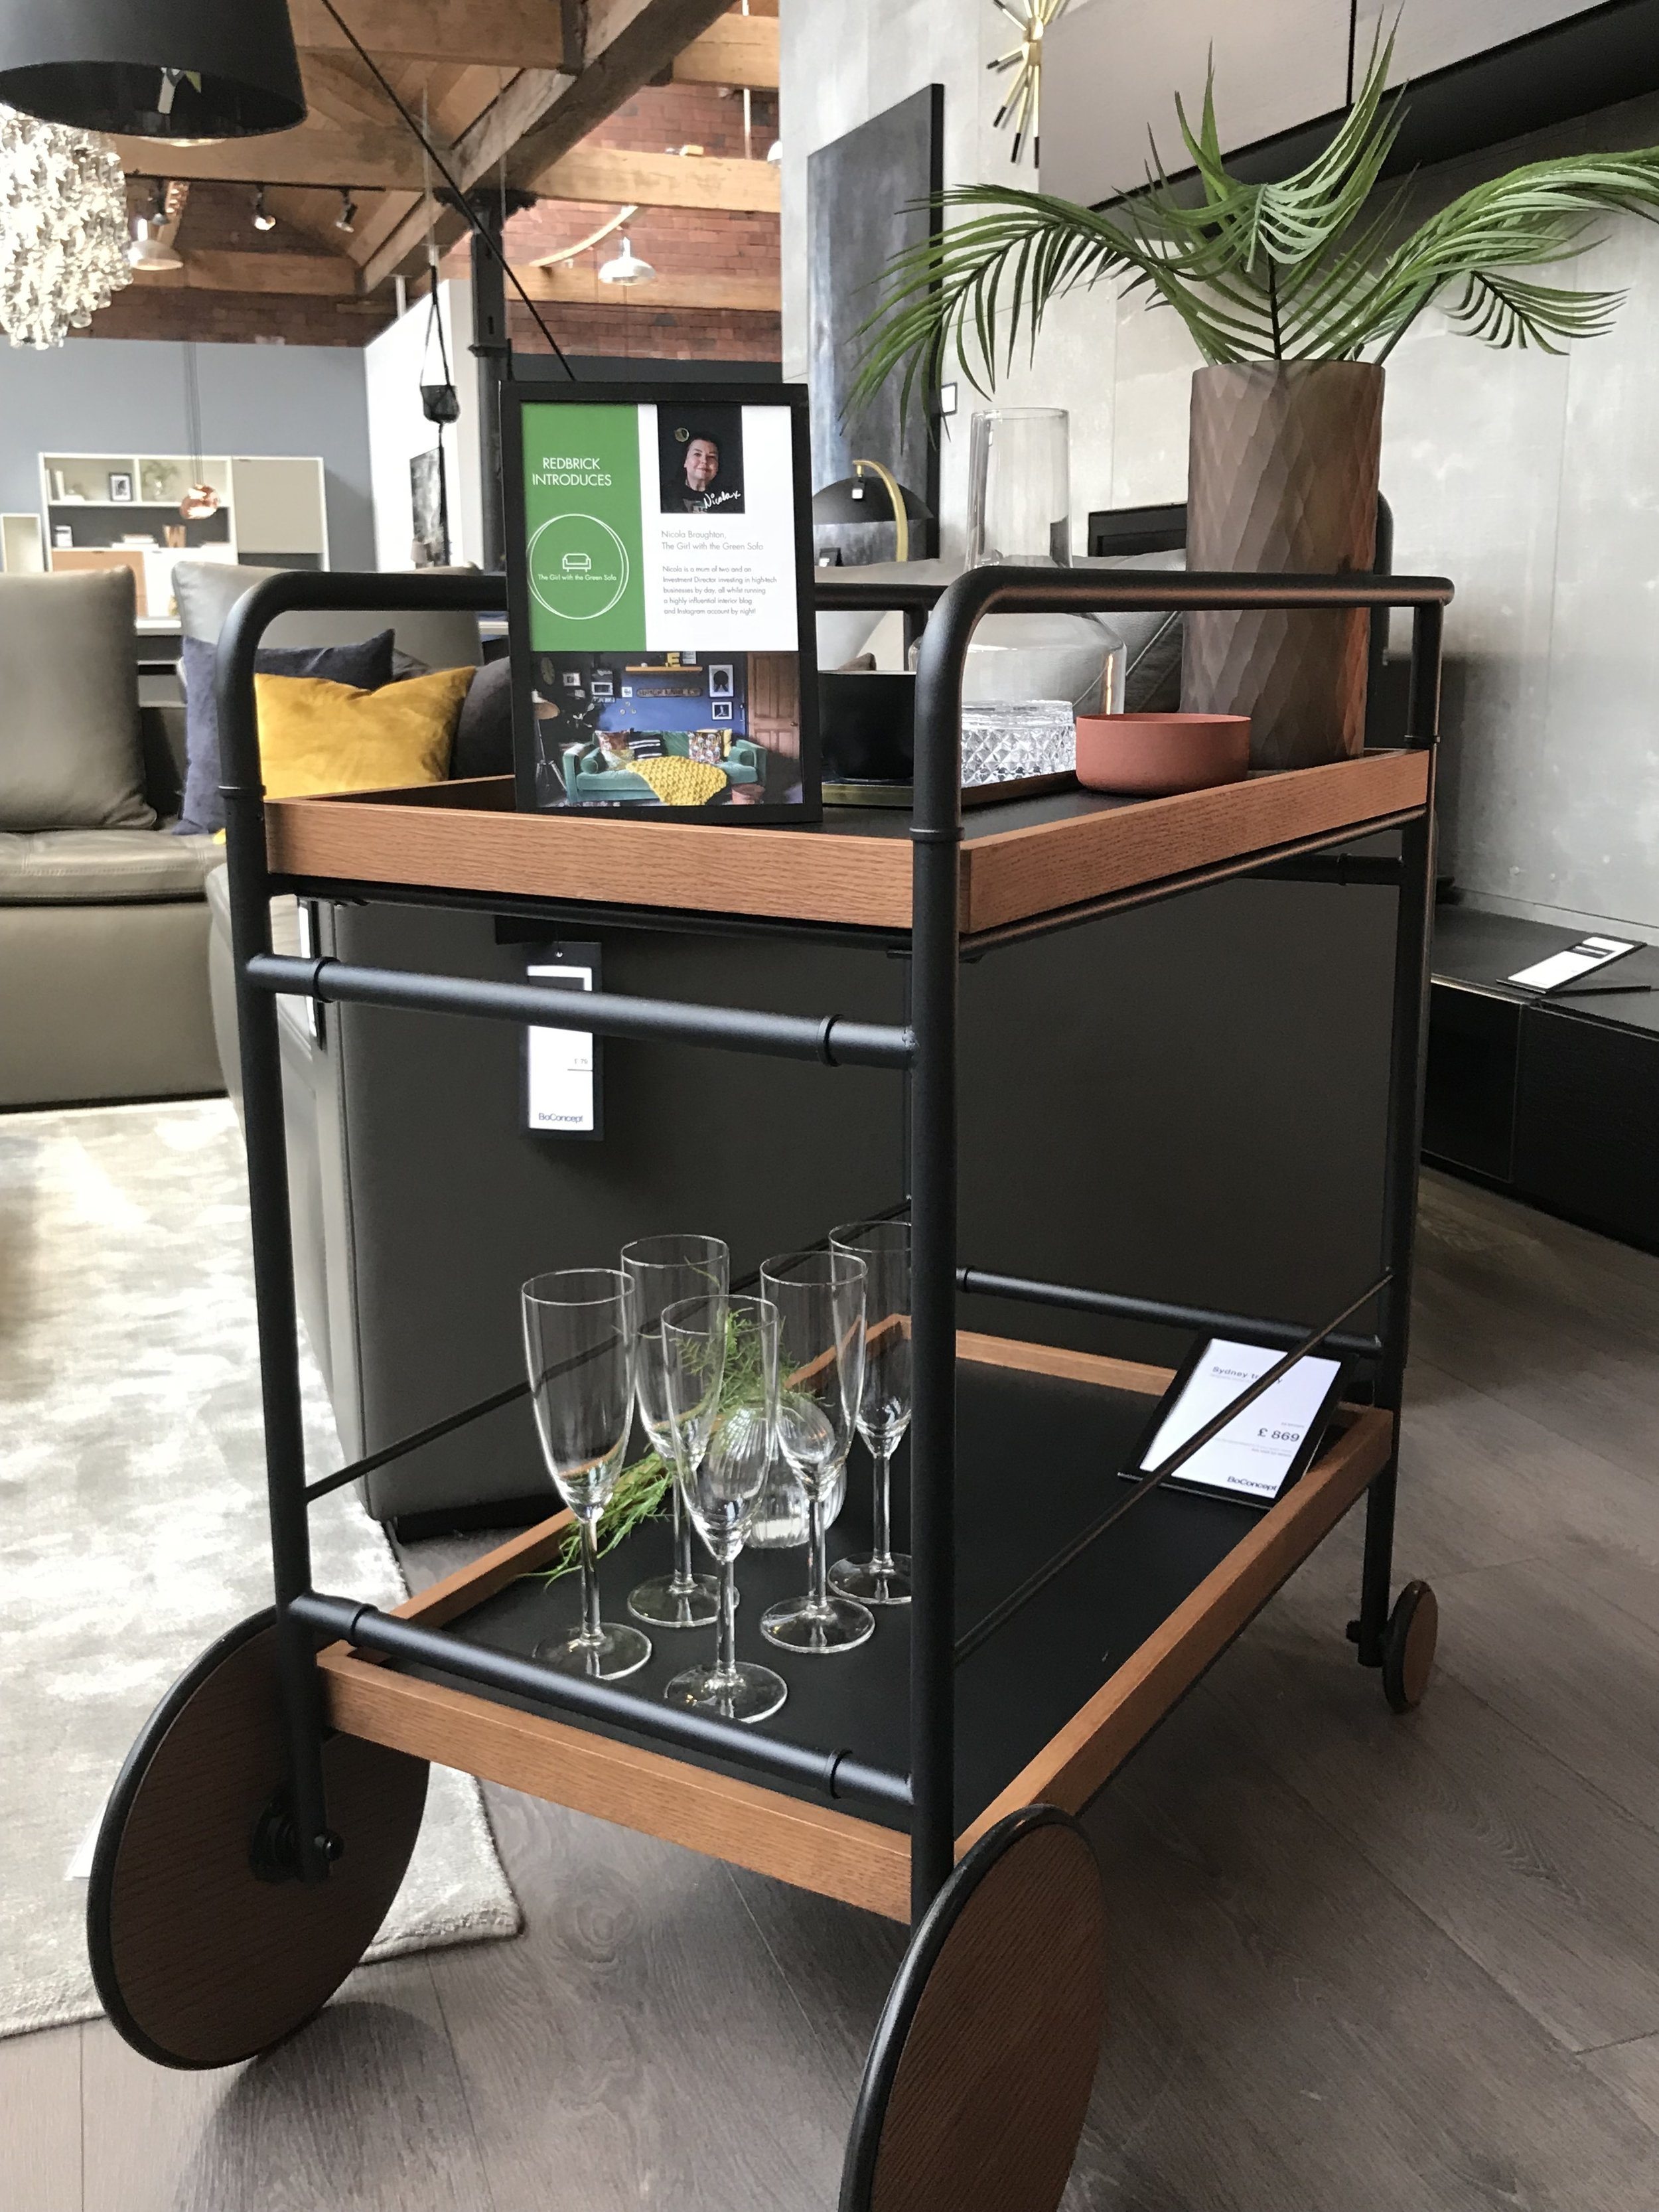 The Sydney bar cart by @boconcept_redbrick